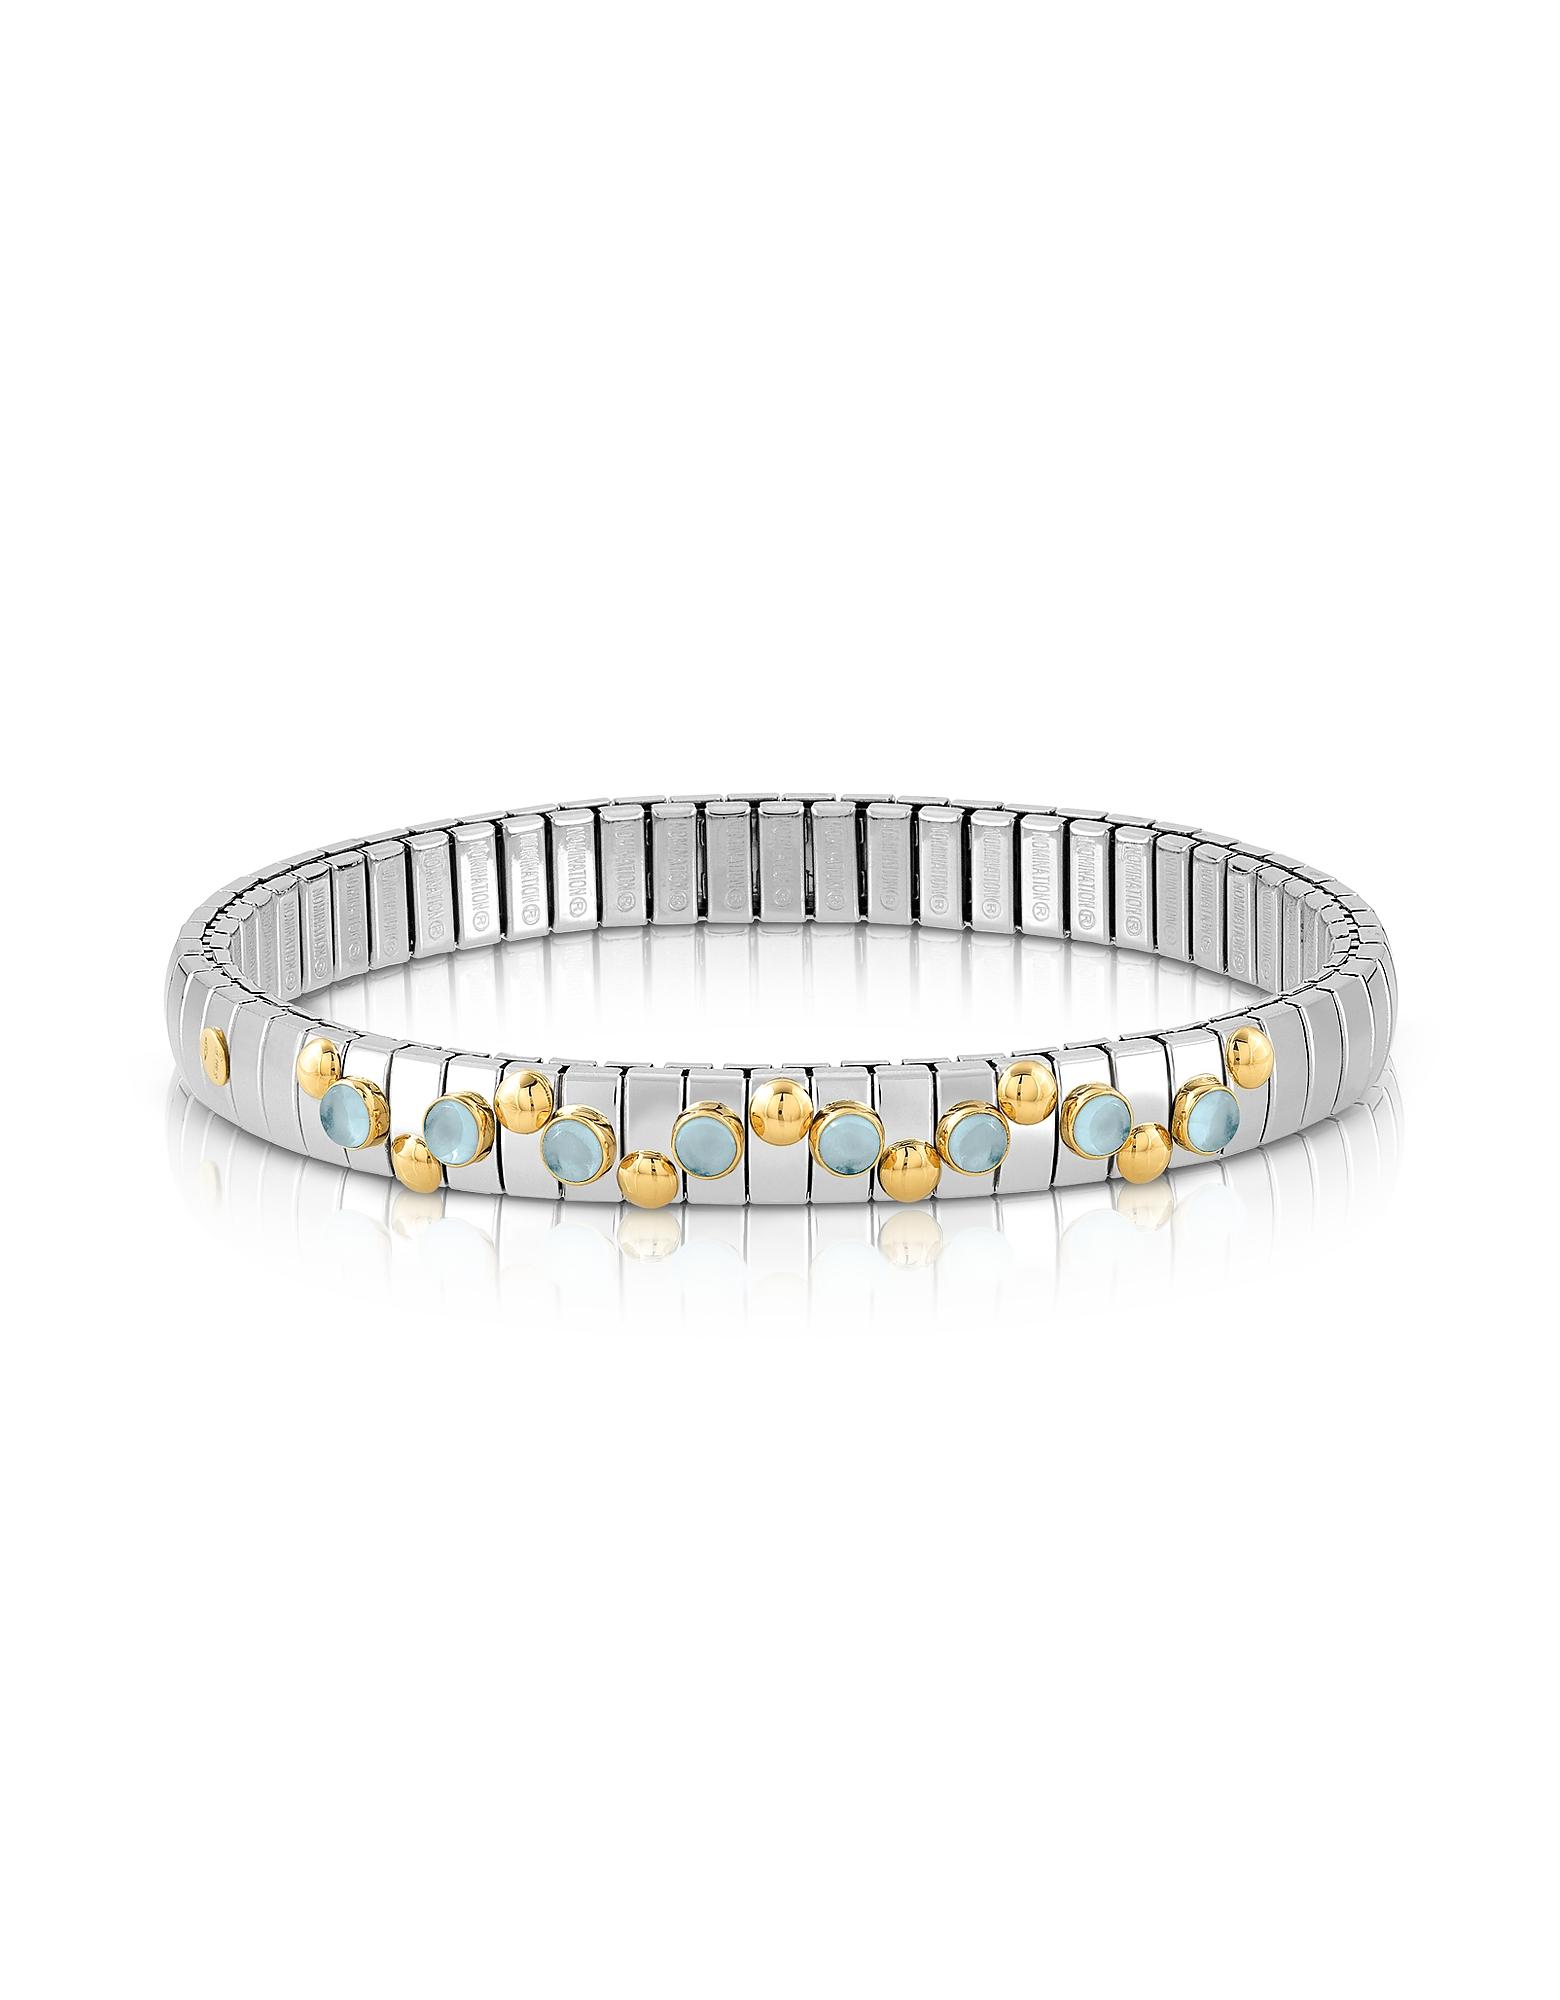 Stainless Steel Women's Bracelet w/Blue Topaz Beads